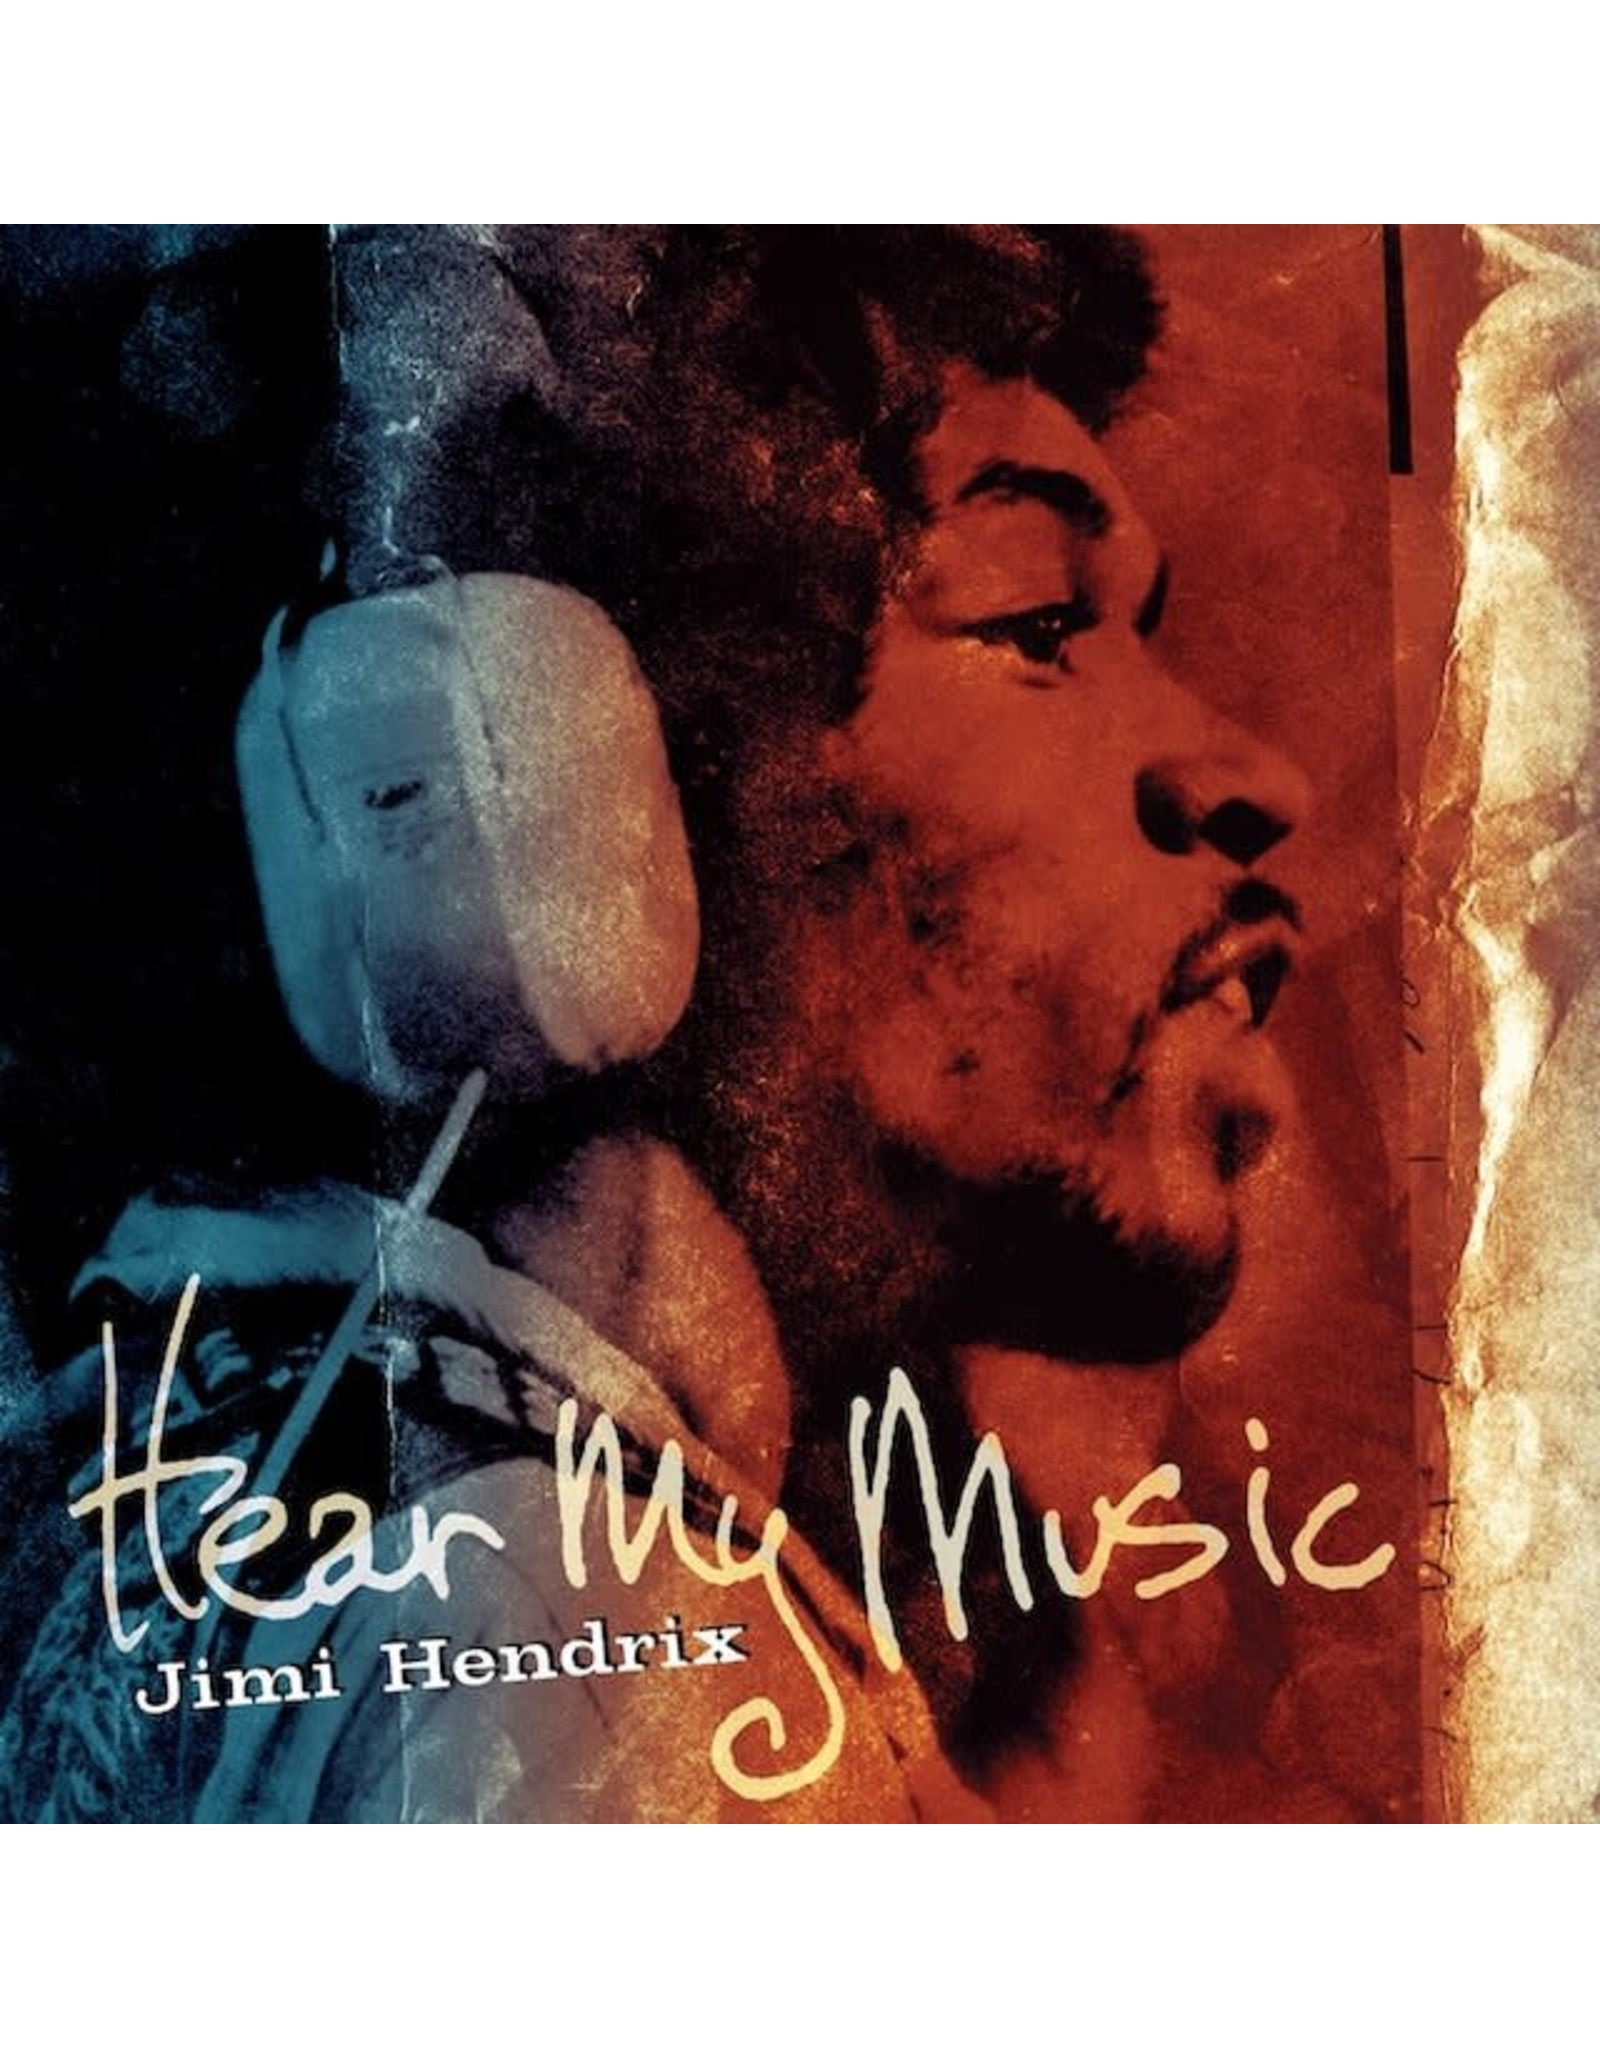 Vinyl Jimi Hendrix - Hear My Music